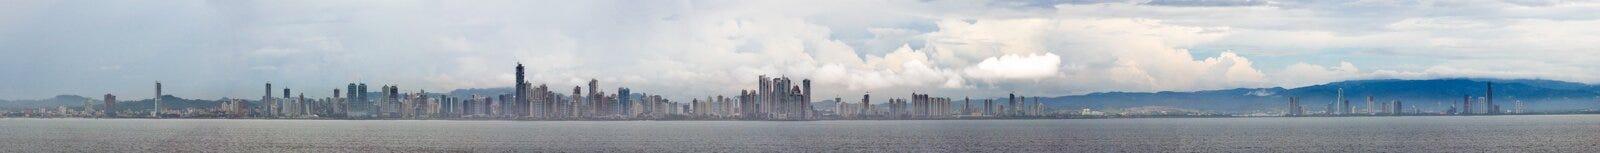 stad panorama- panama arkivfoto